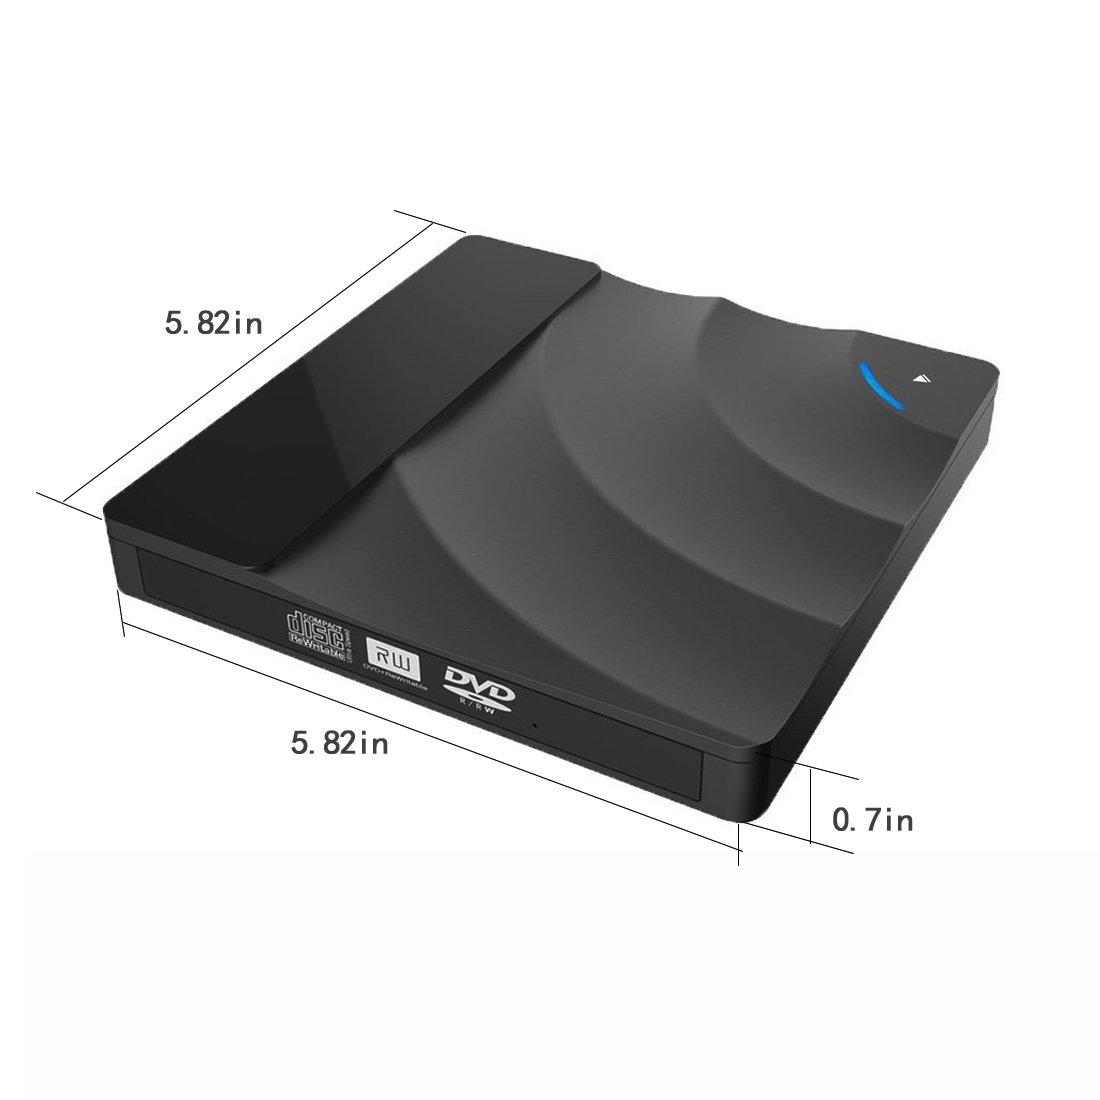 Sunreal External DVD Drive, USB 3.0 CD DVD Drive Ultra Slim Portable Touch Control CD/DVD Burner Writer Reader Player for Laptop/Desktop Computer, Support Windows/Vista/ Mac OS(Black) by Sunreal (Image #4)